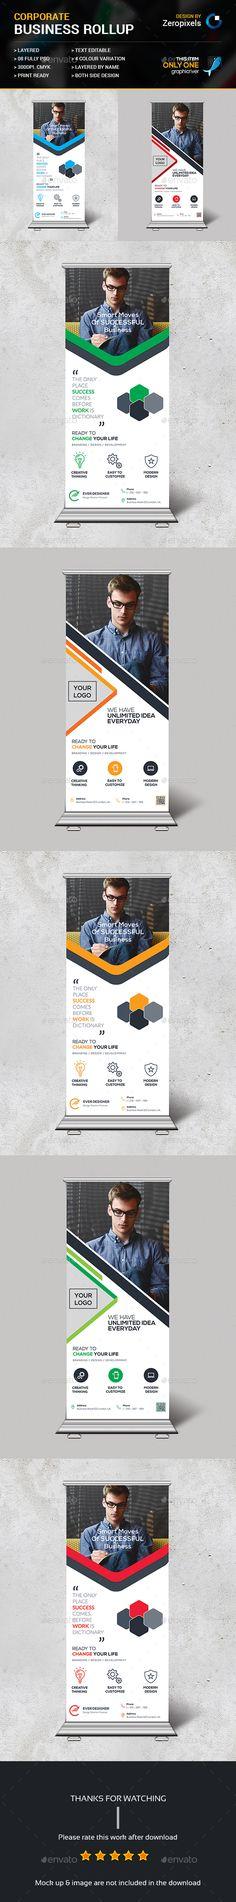 Roll-Up Banner Template PSD Bundle. Download here: http://graphicriver.net/item/roll-up-bundle/15557848?ref=ksioks